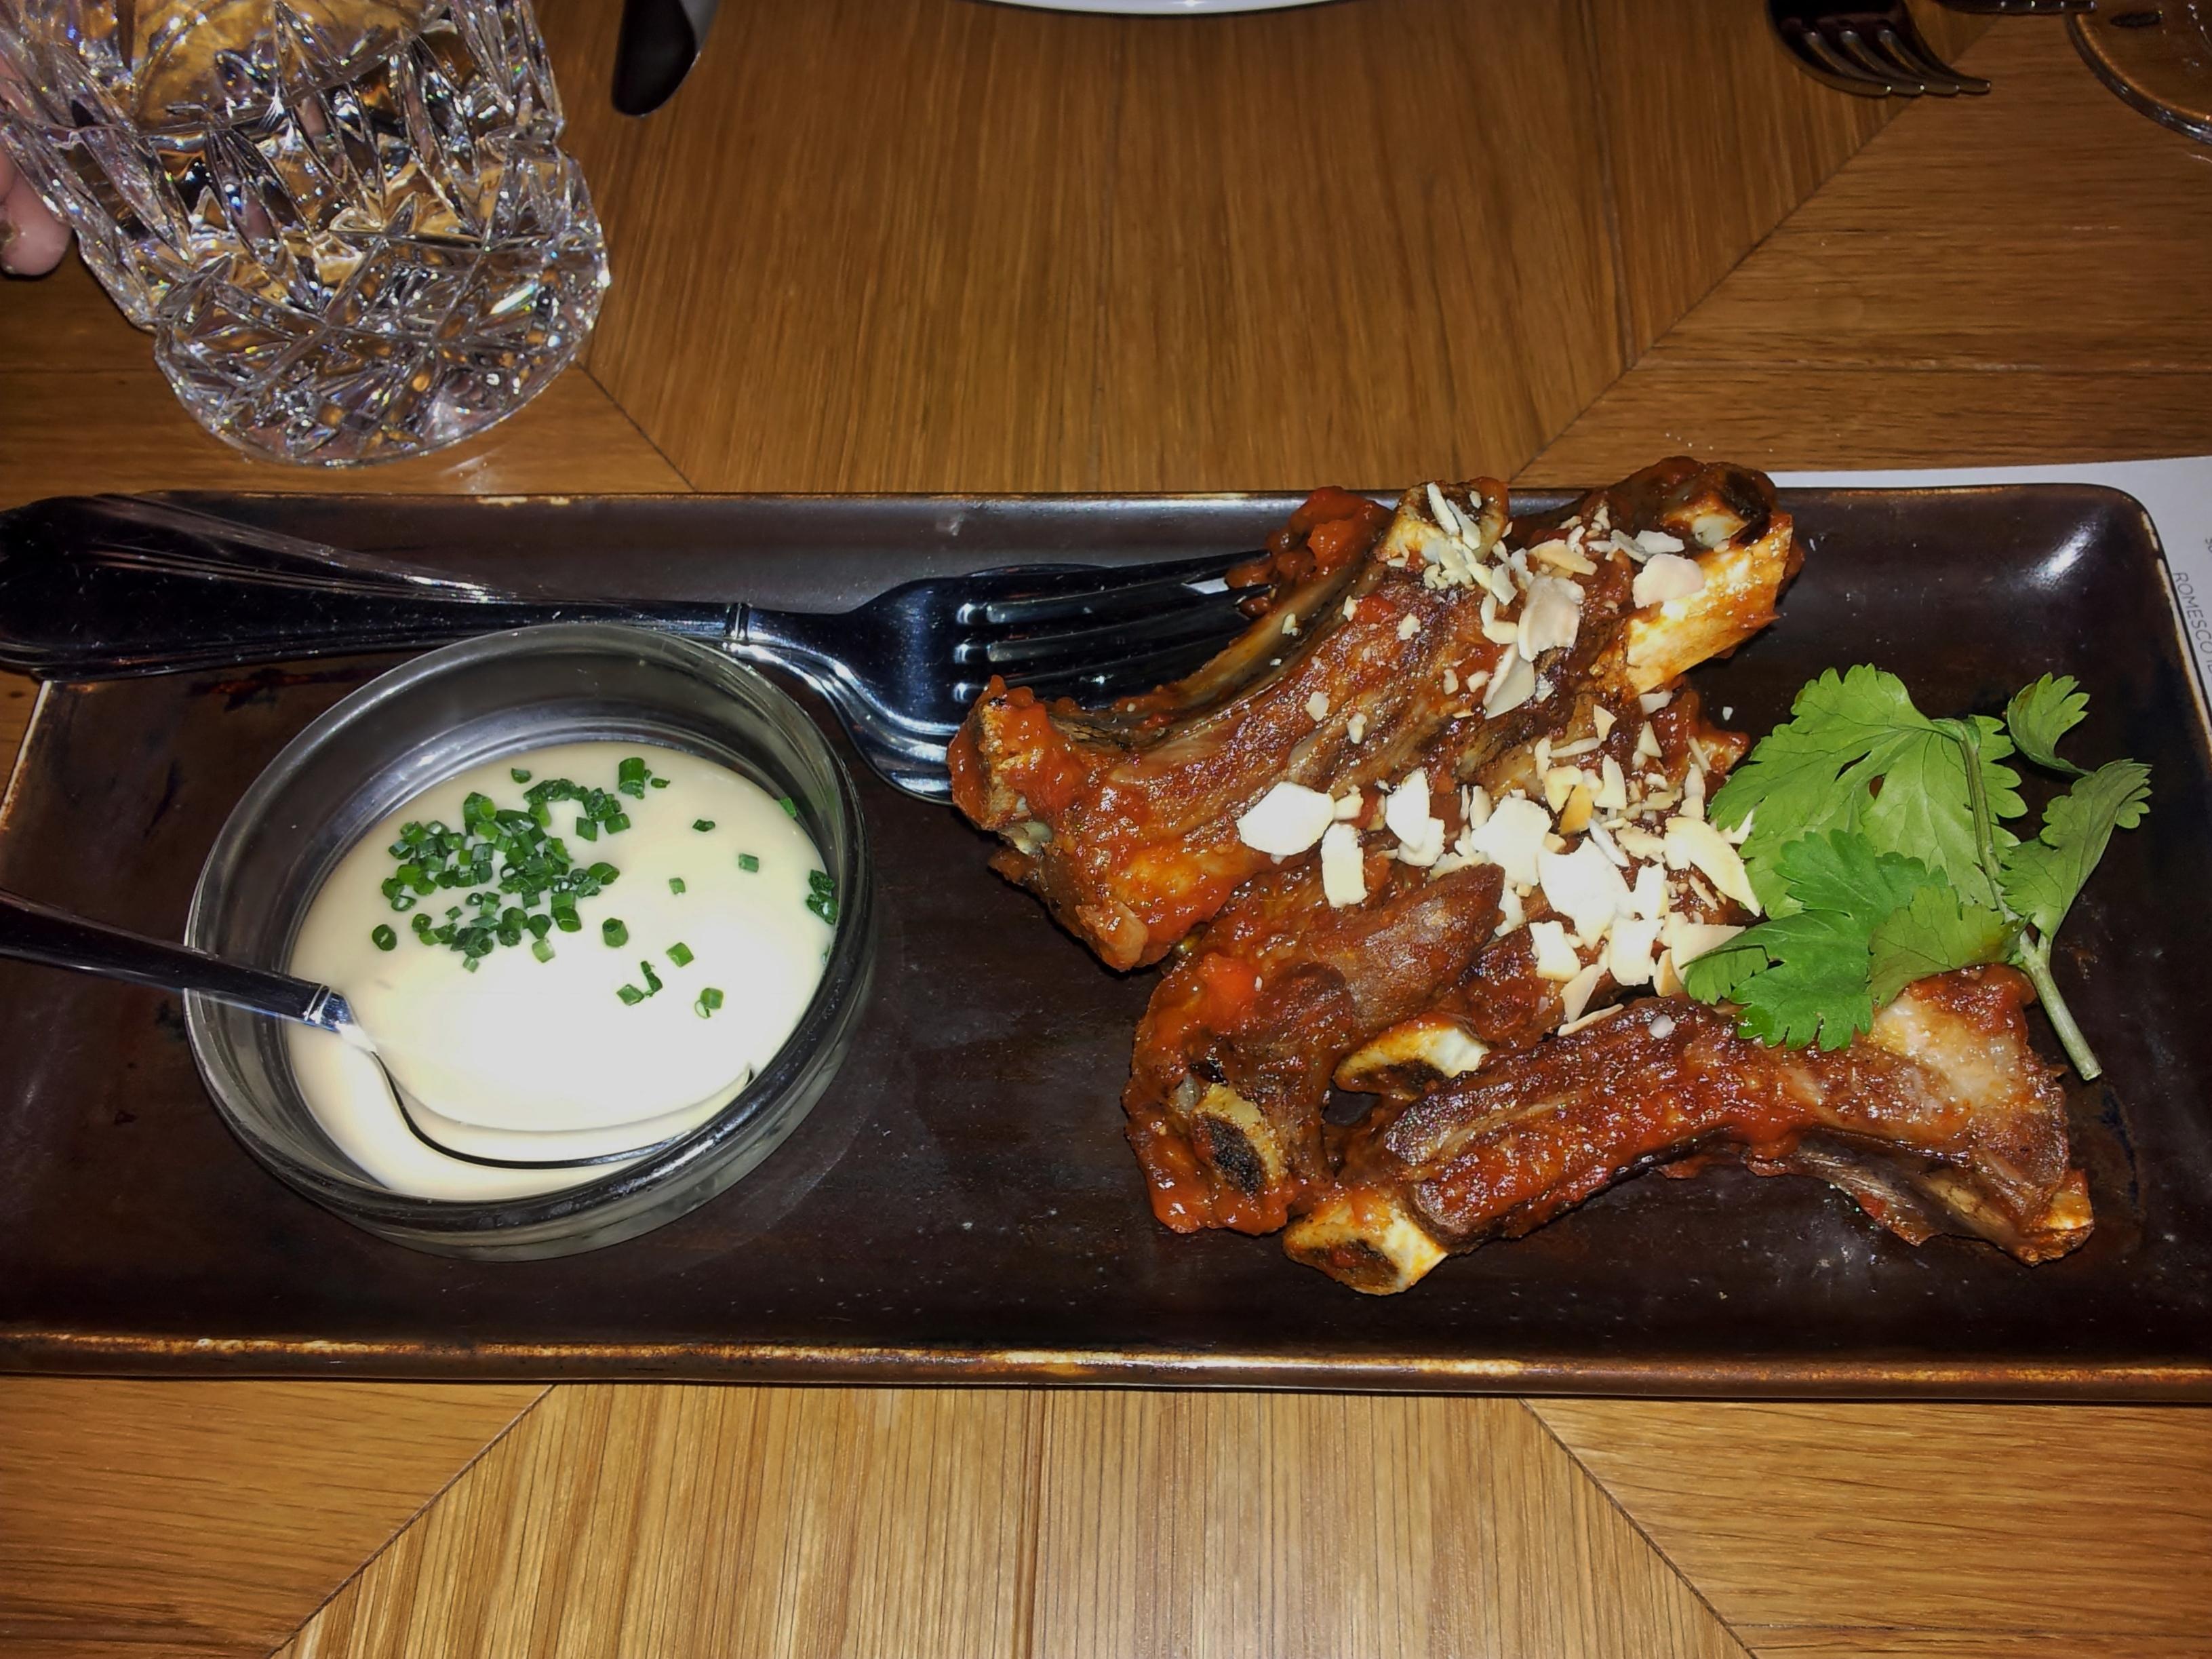 Ravintola Bronda, Helsinki: Romesco iberico ribs & almond salad